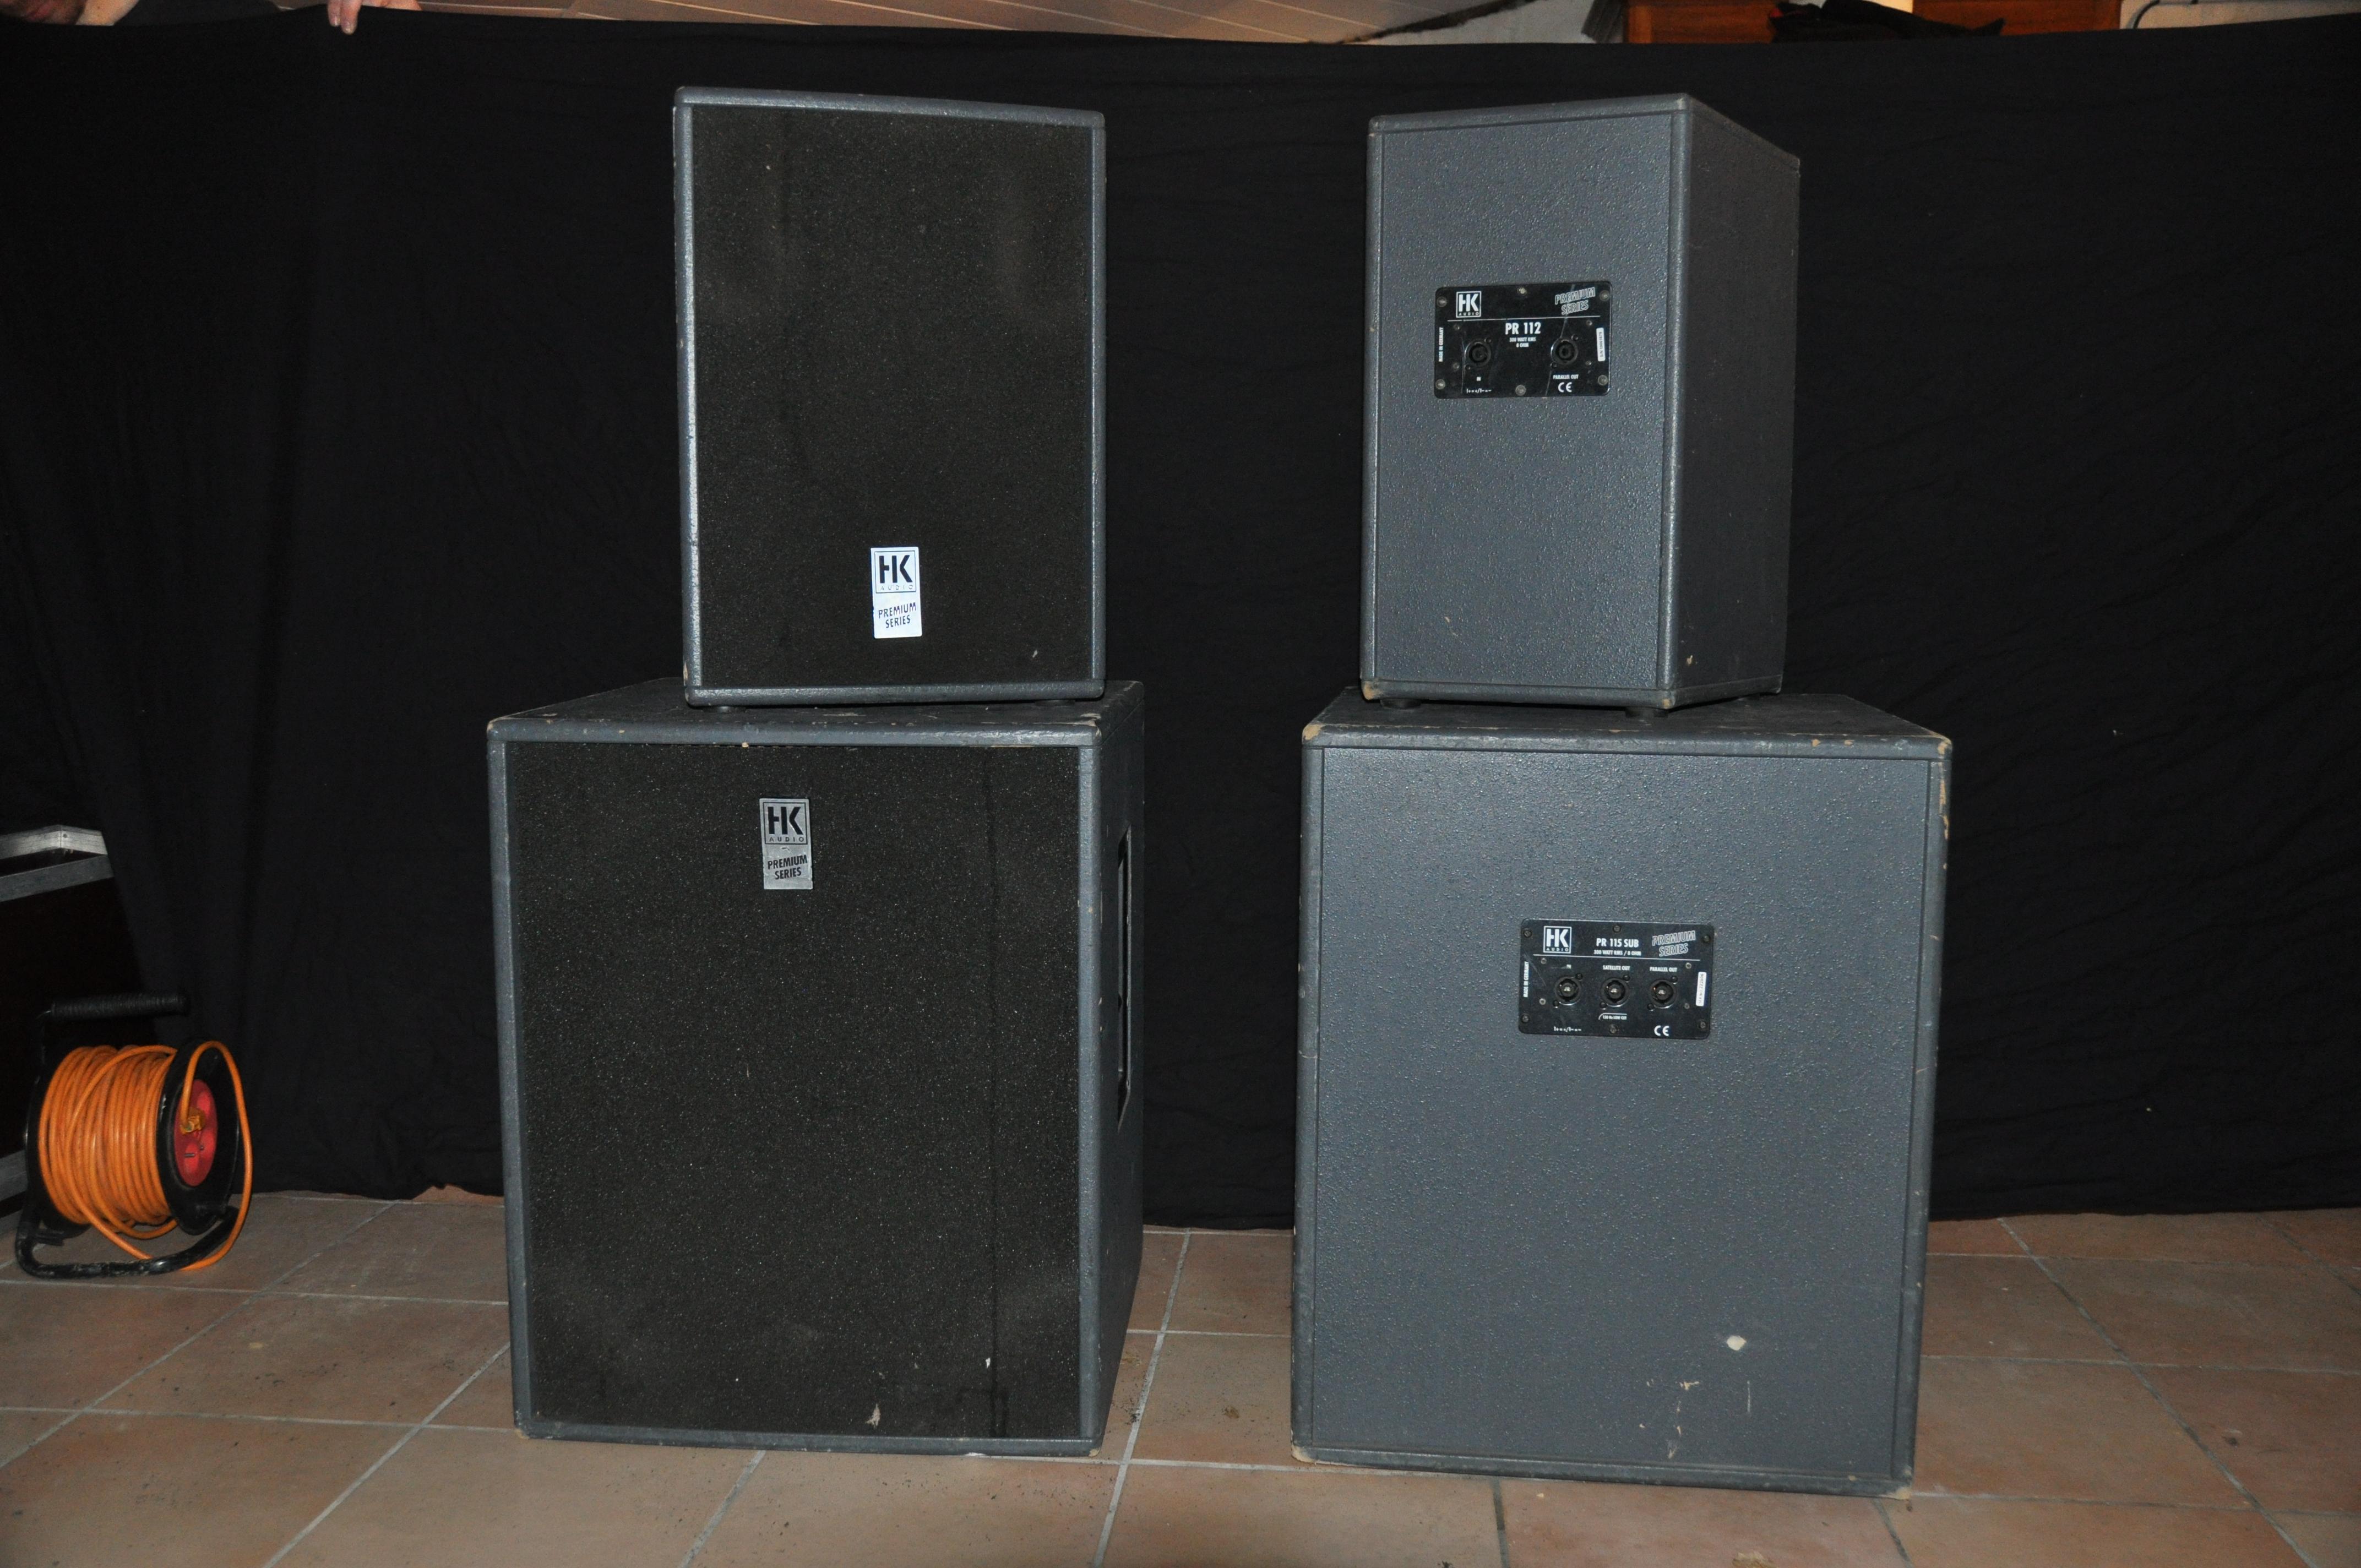 hk audio pr 115 sub image 389998 audiofanzine. Black Bedroom Furniture Sets. Home Design Ideas